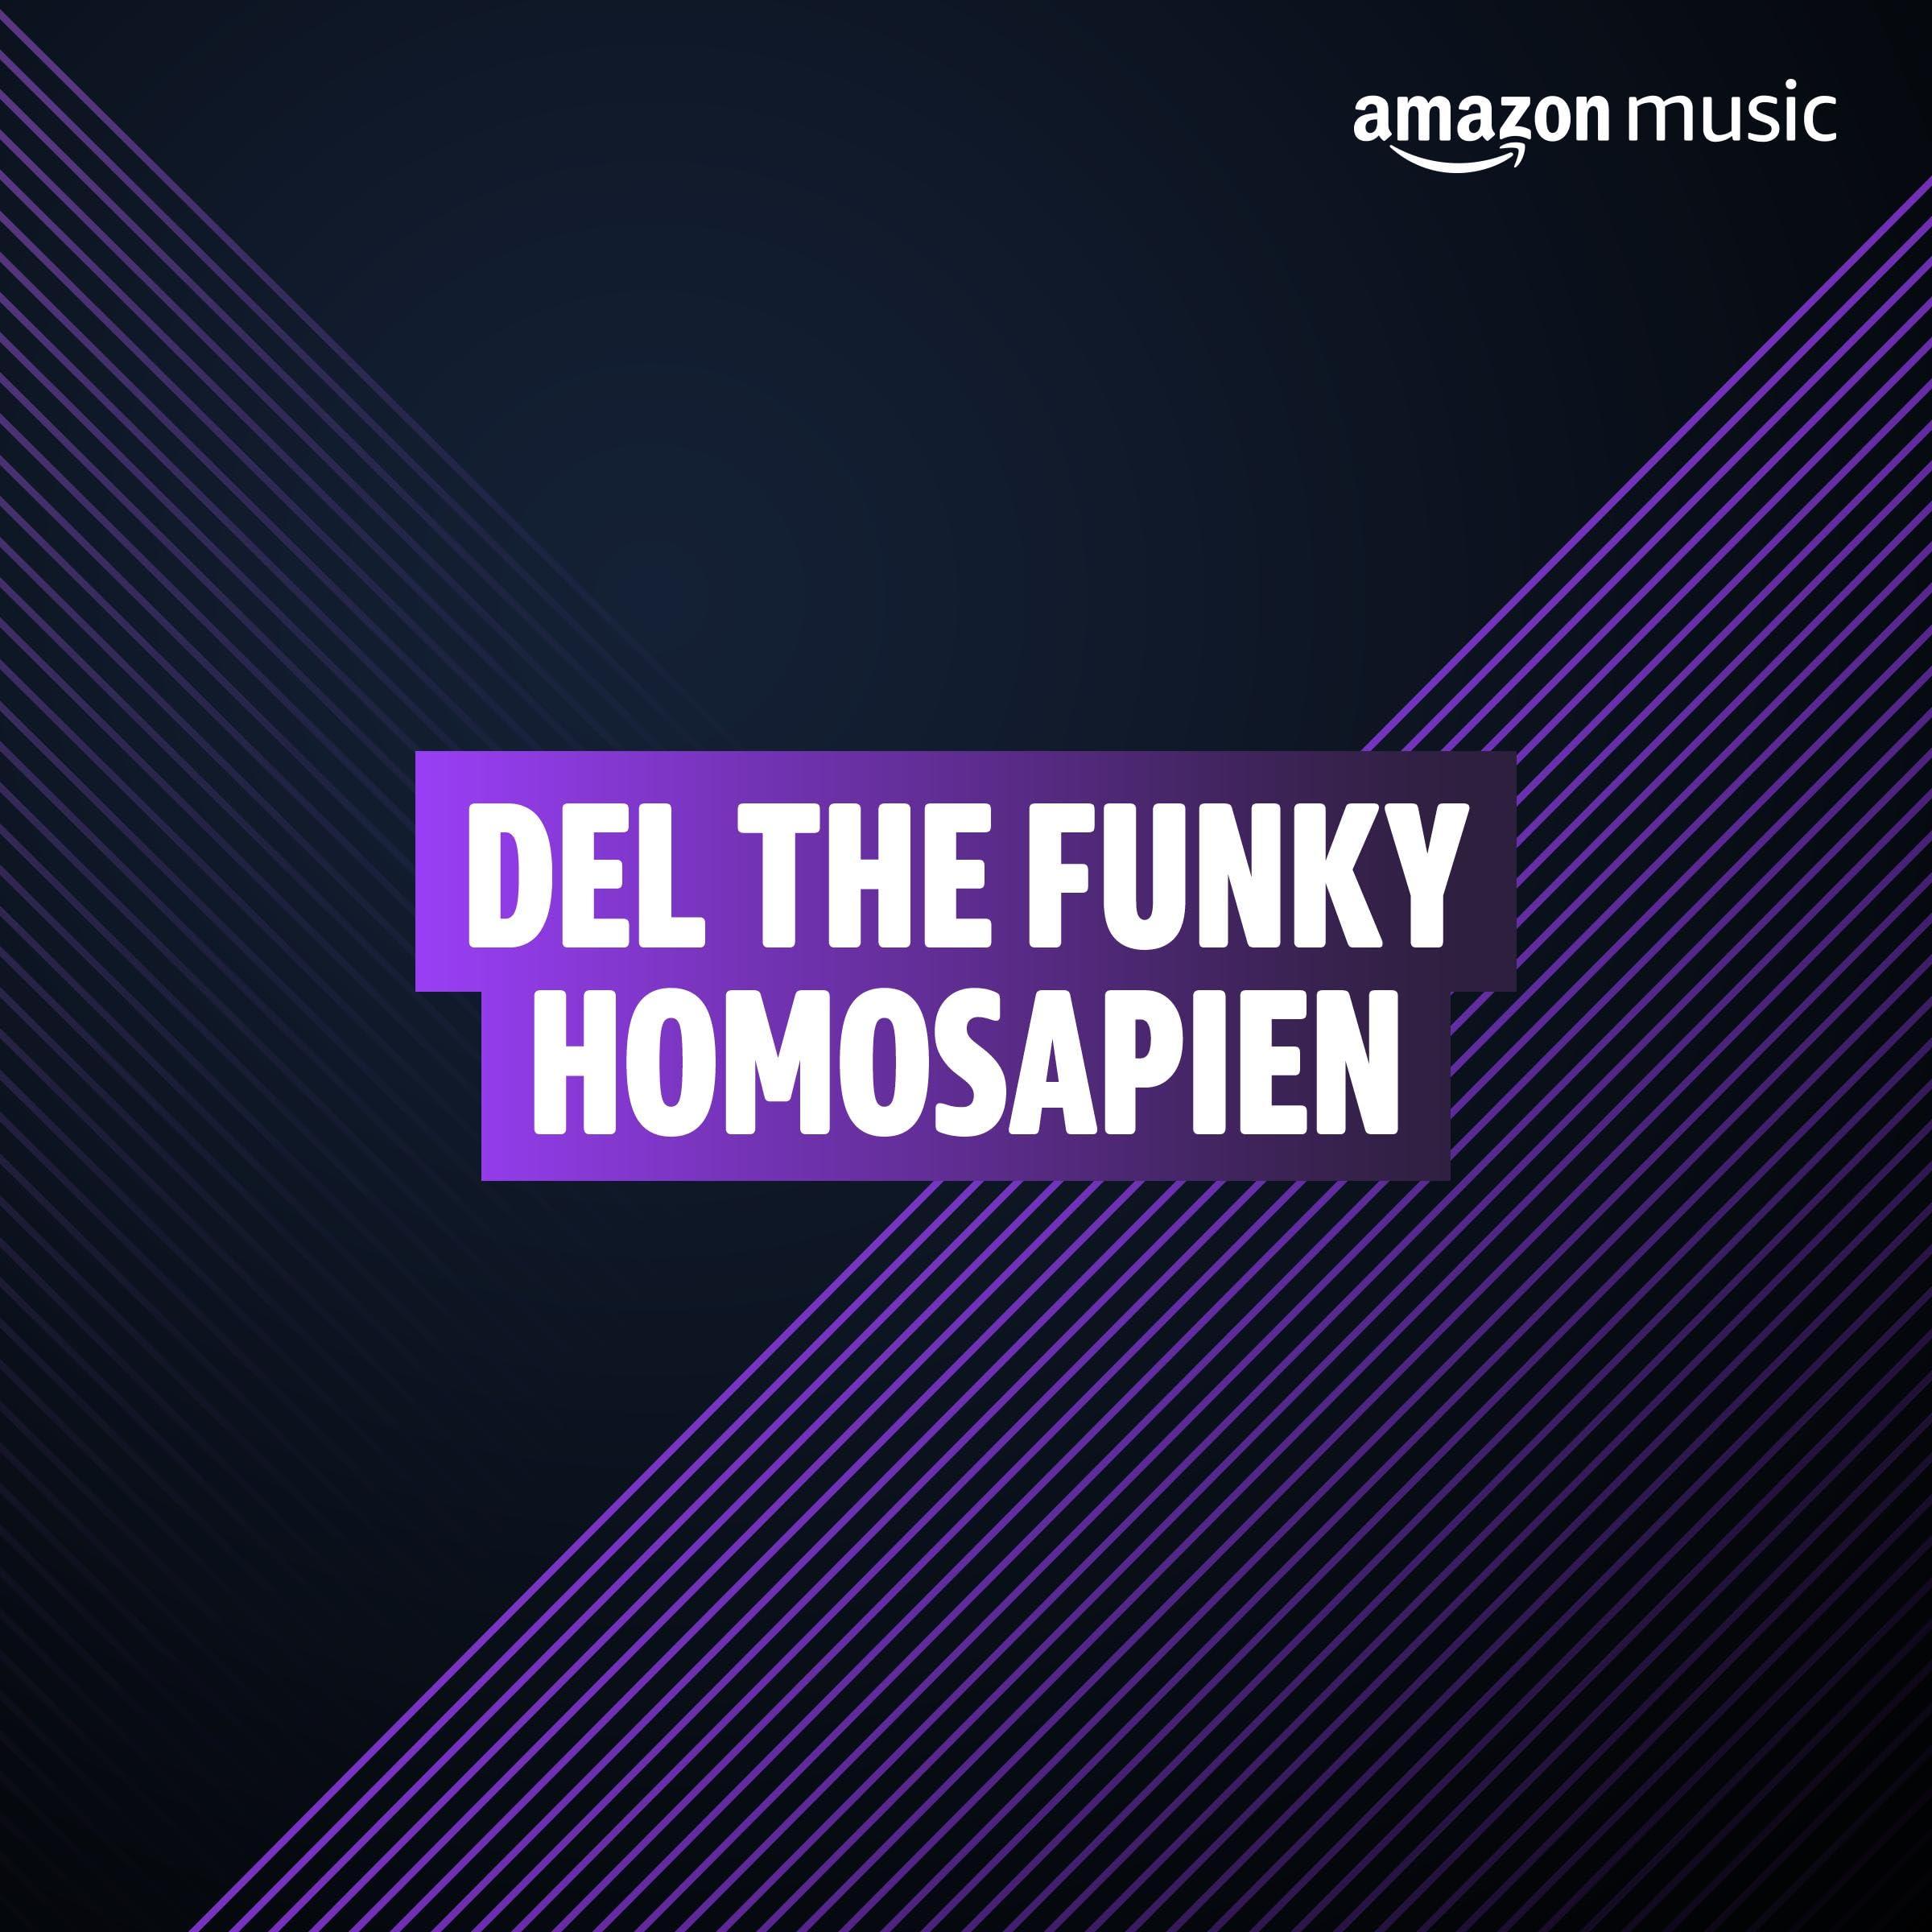 Del The Funky Homosapien